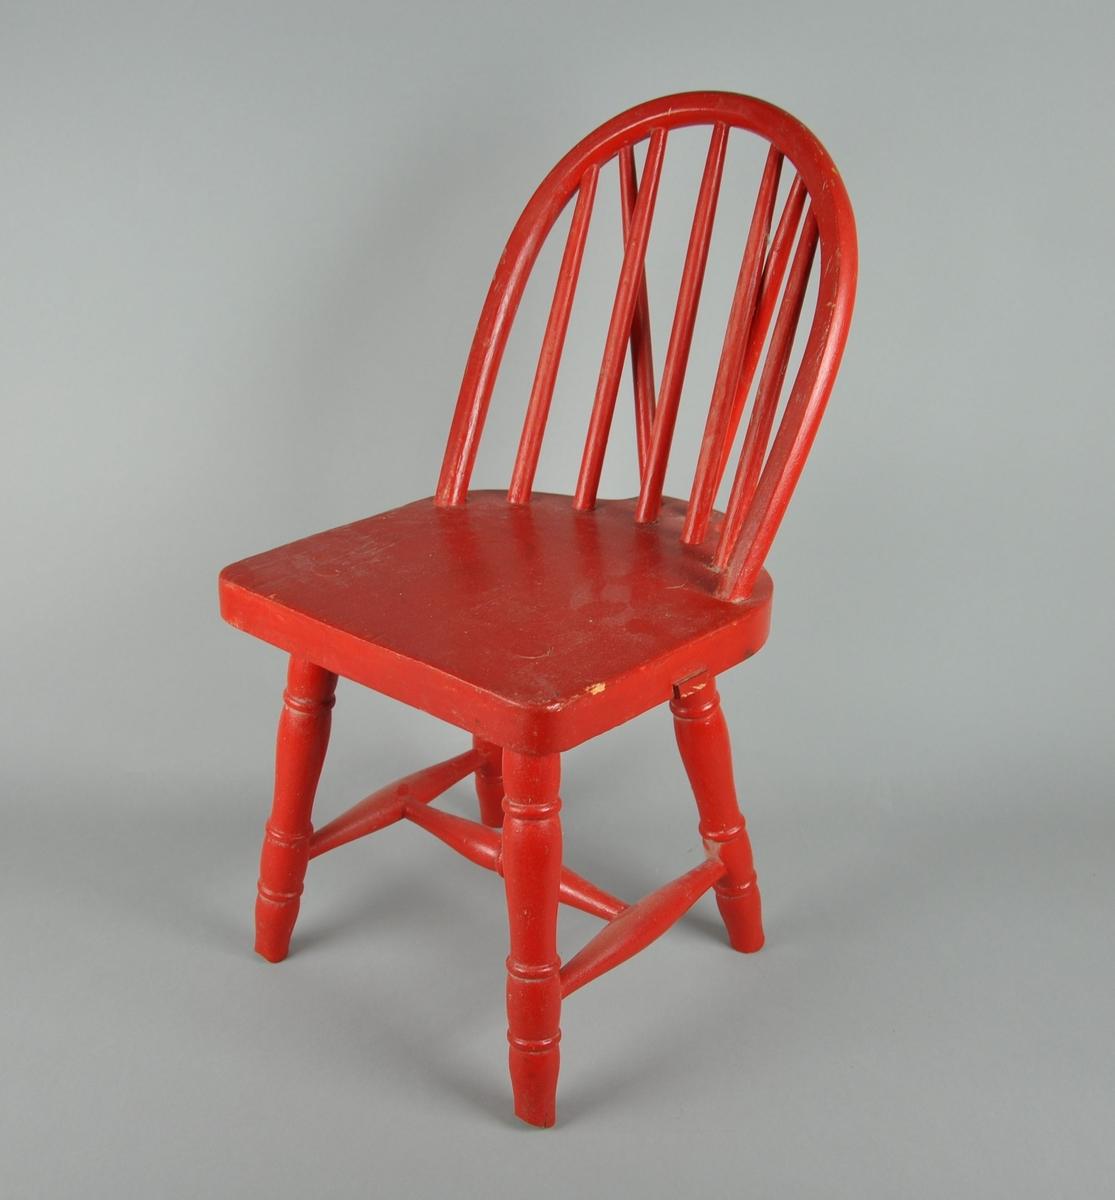 Rødmalt barnestol av tre. Stolen er formet som en budalsstol.